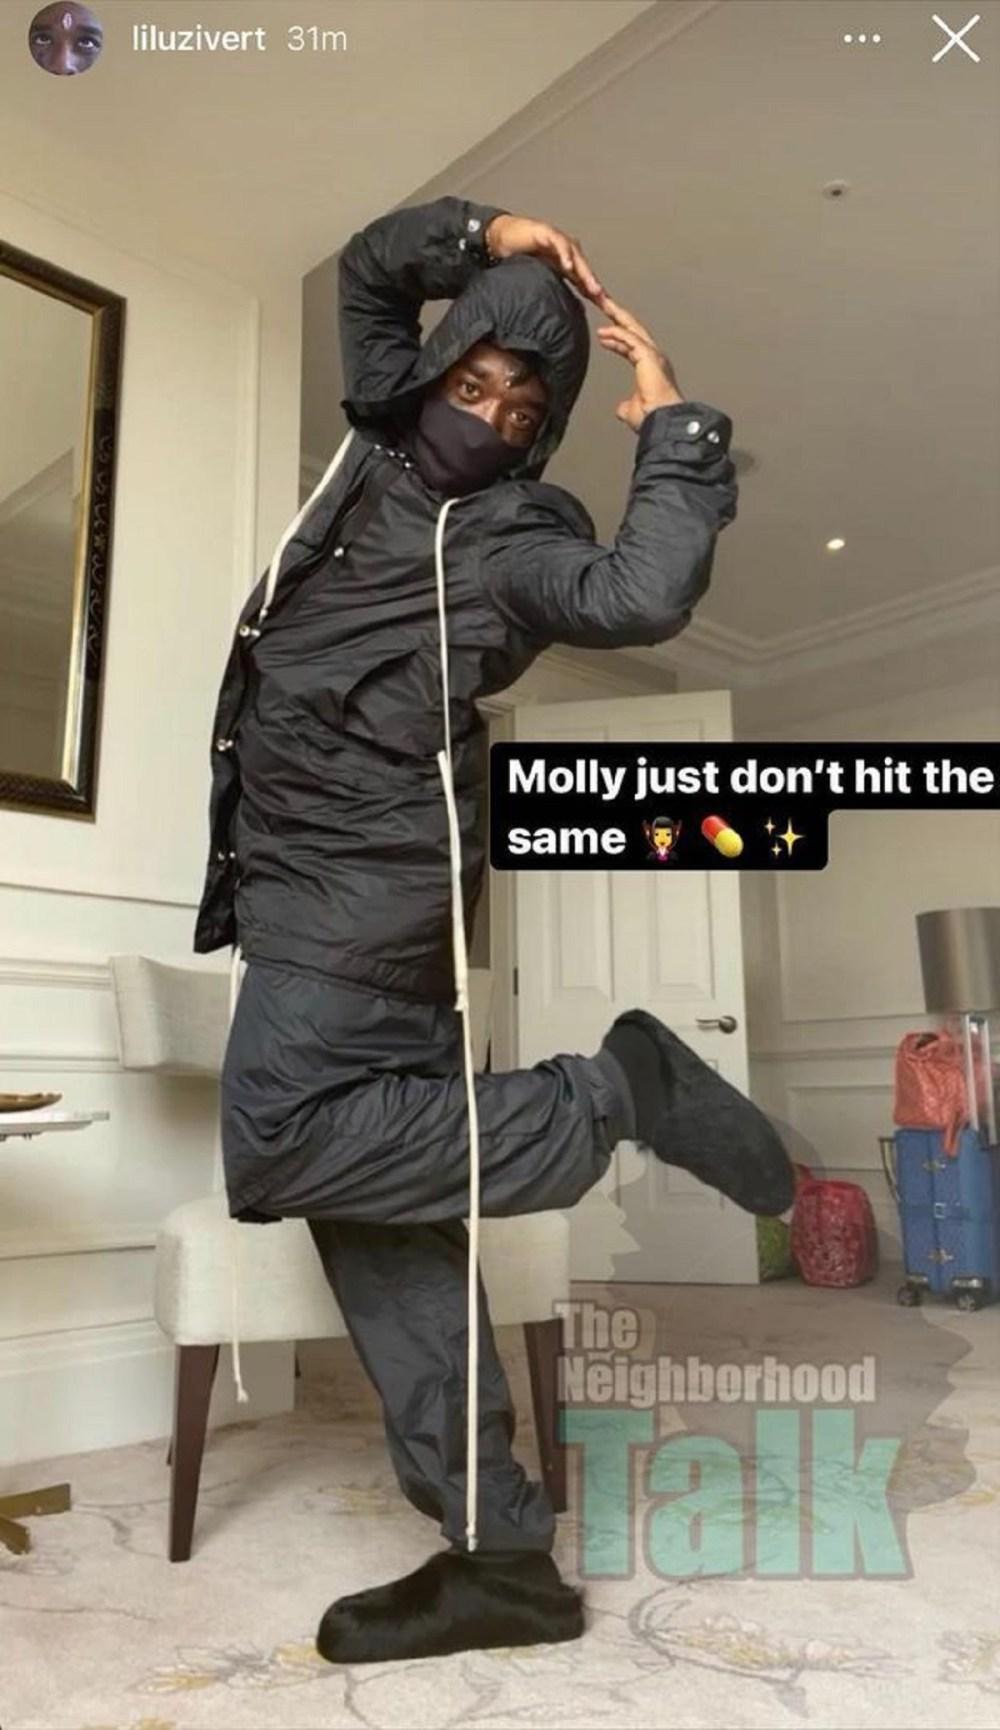 Lil Uzi Vert strikes ballerina pose on Instagram